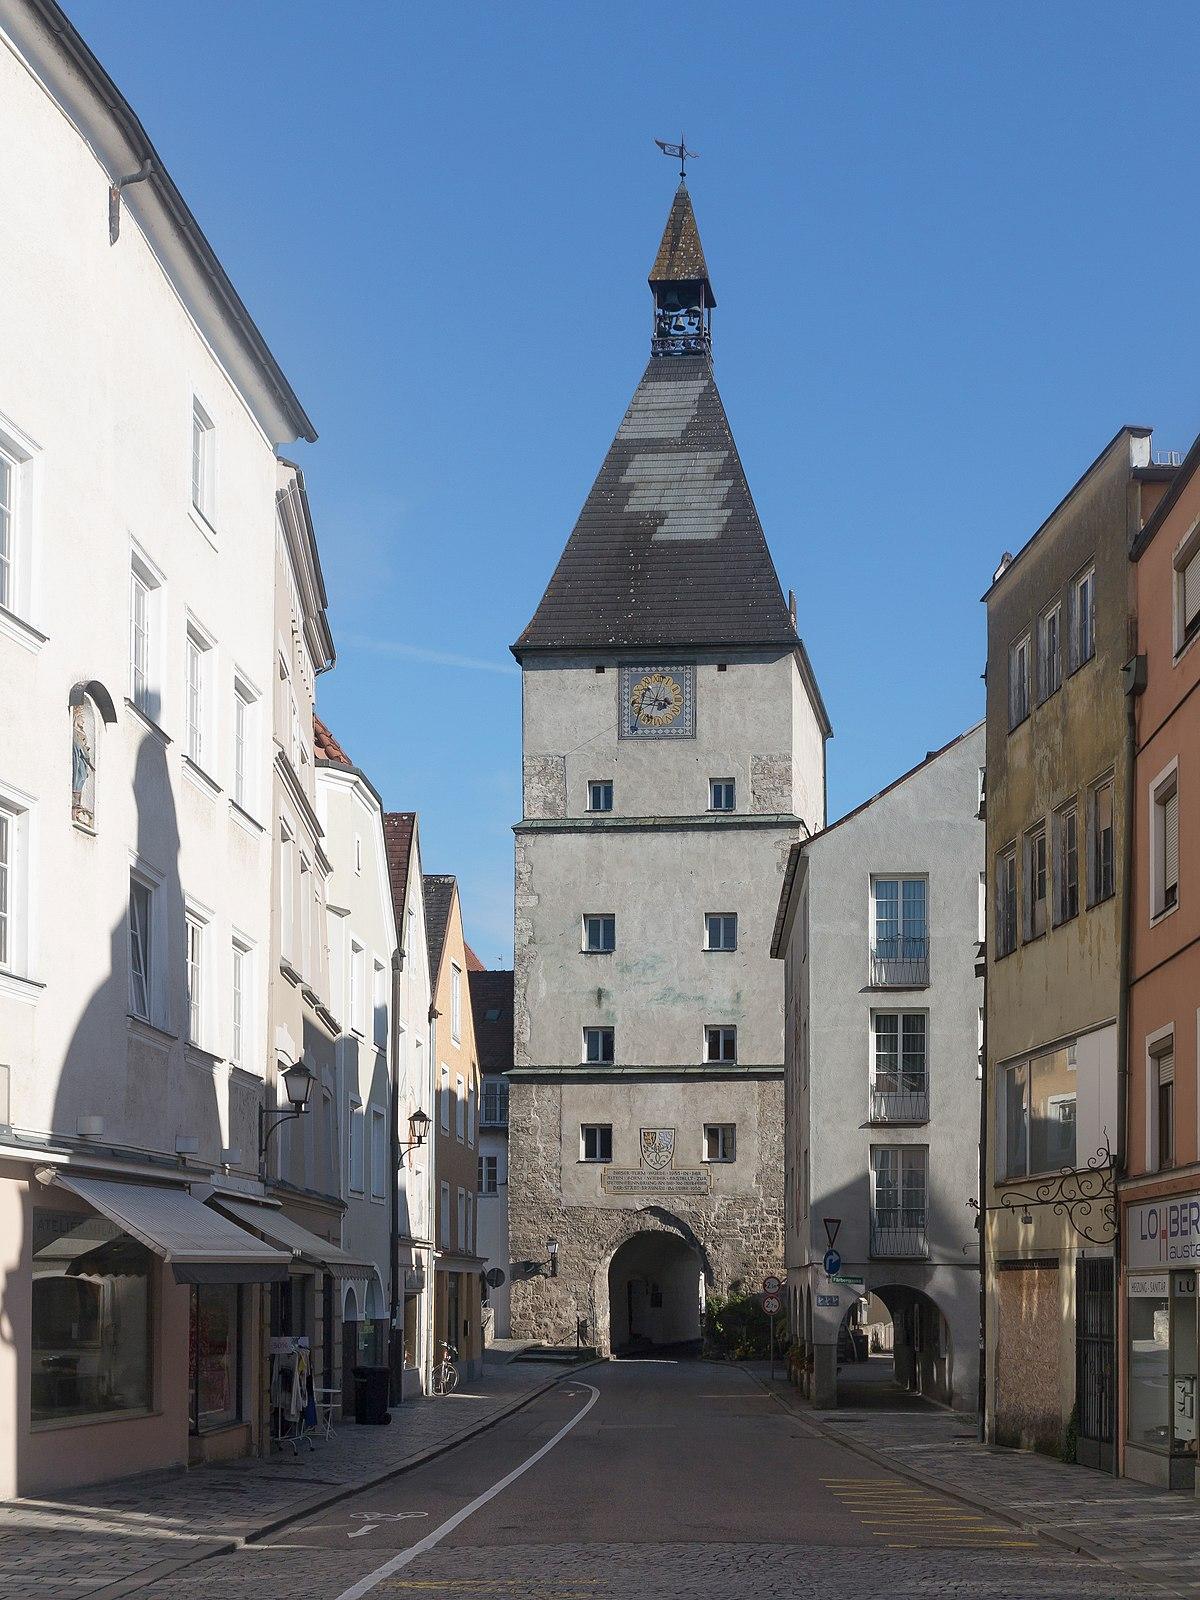 Datei:Braunau am Inn - carolinavolksfolks.com Wikipedia